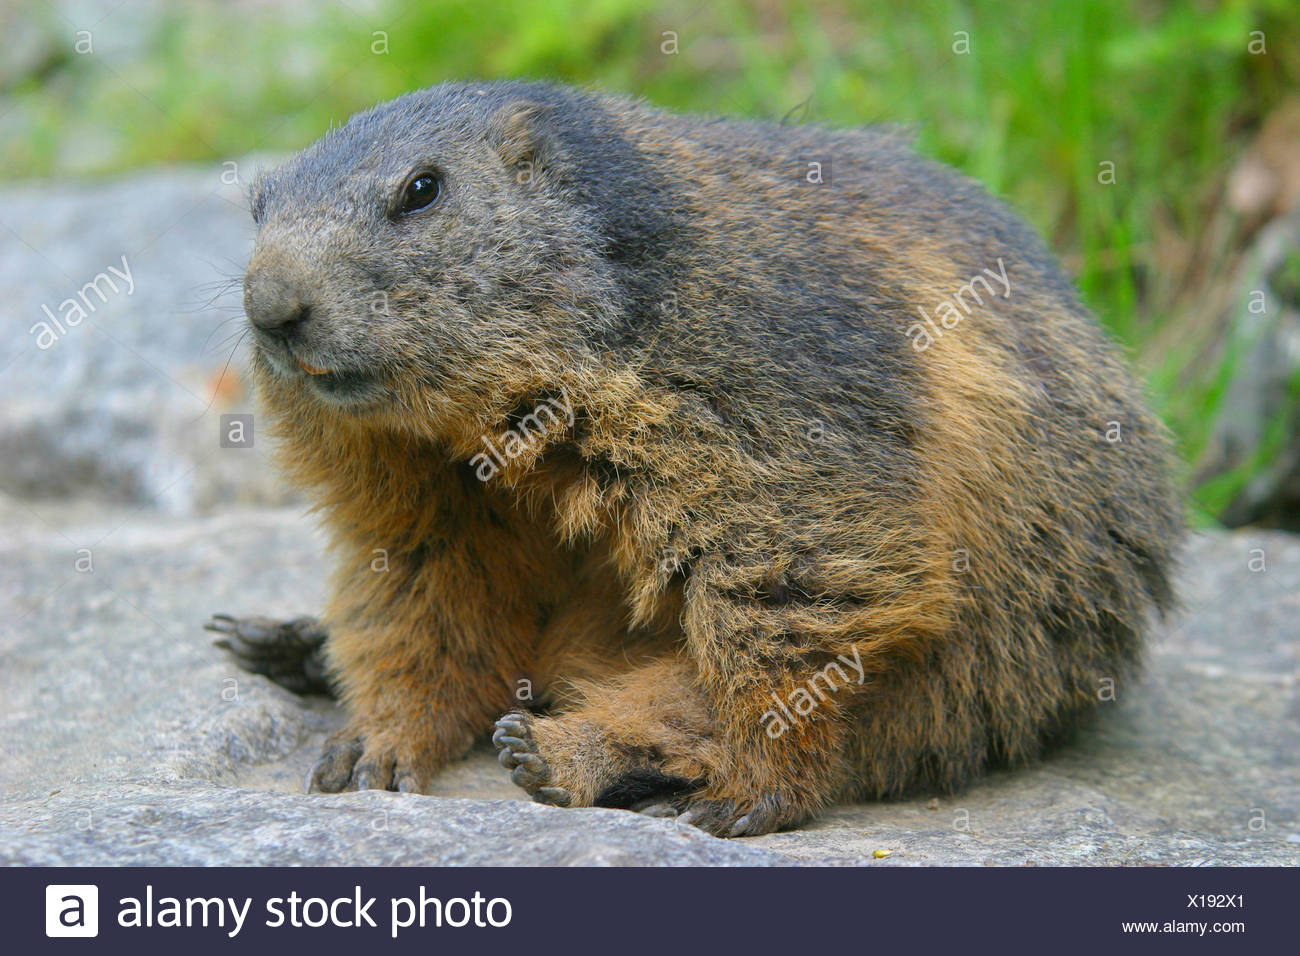 alpine marmot (Marmota marmota), sitting on a stone, Austria - Stock Image